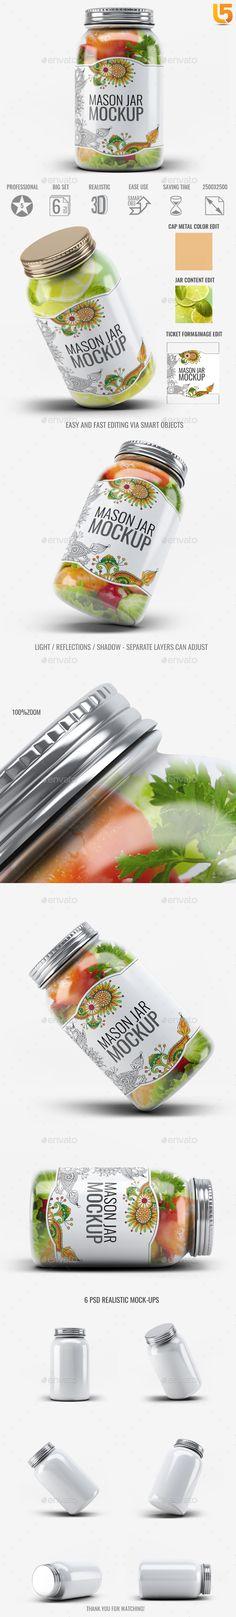 Mason Jar MockUp V.1 — Photoshop PSD #food #drink • Available here → https://graphicriver.net/item/mason-jar-mockup-v1/19529756?ref=pxcr